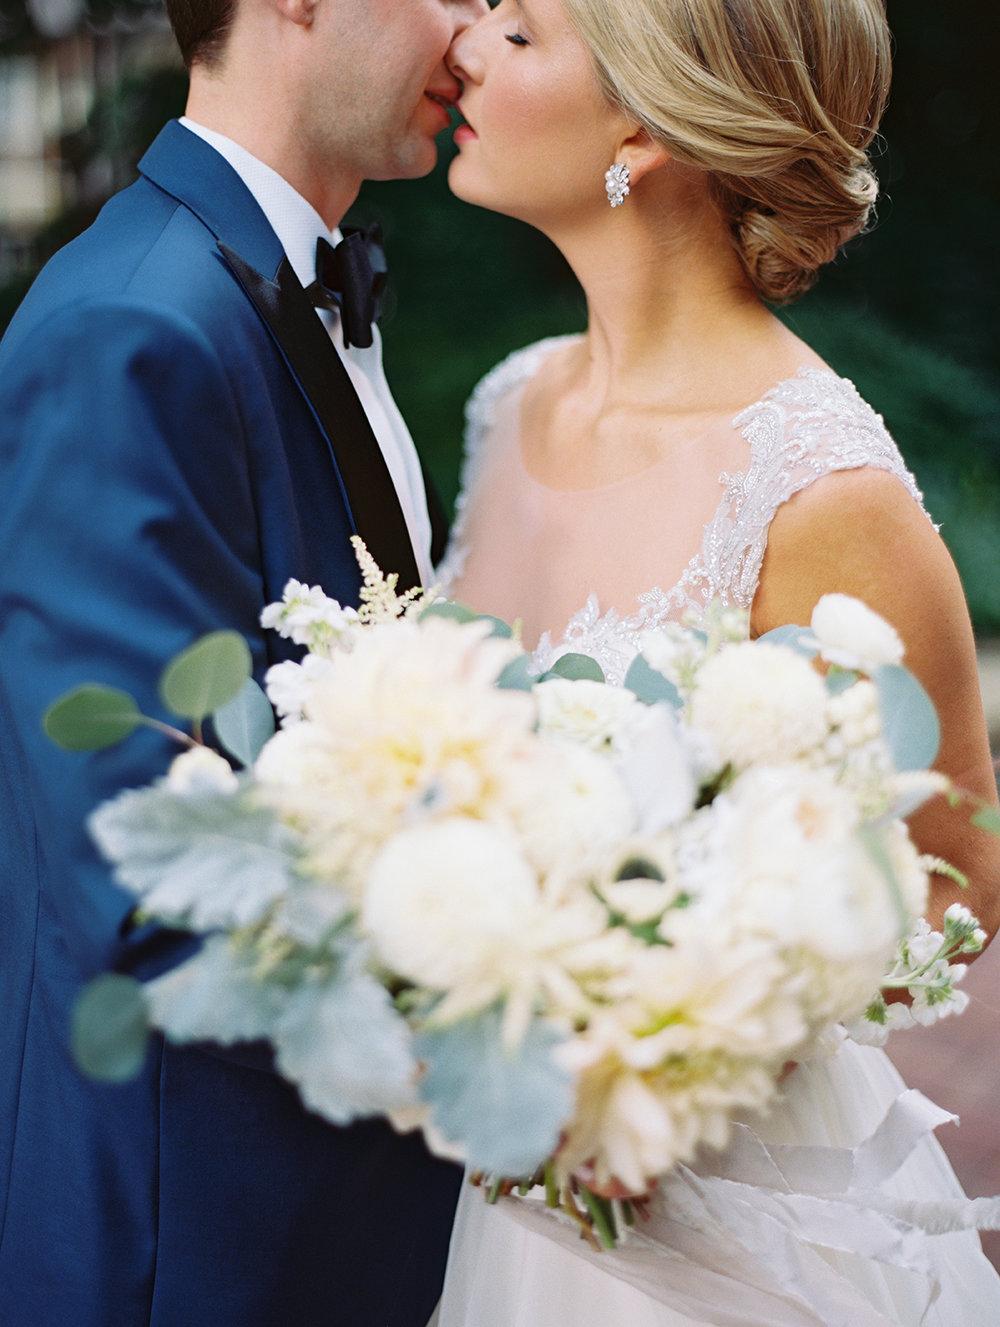 192-andrew-megan-boston-public-library-wedding-film-photographer.jpg